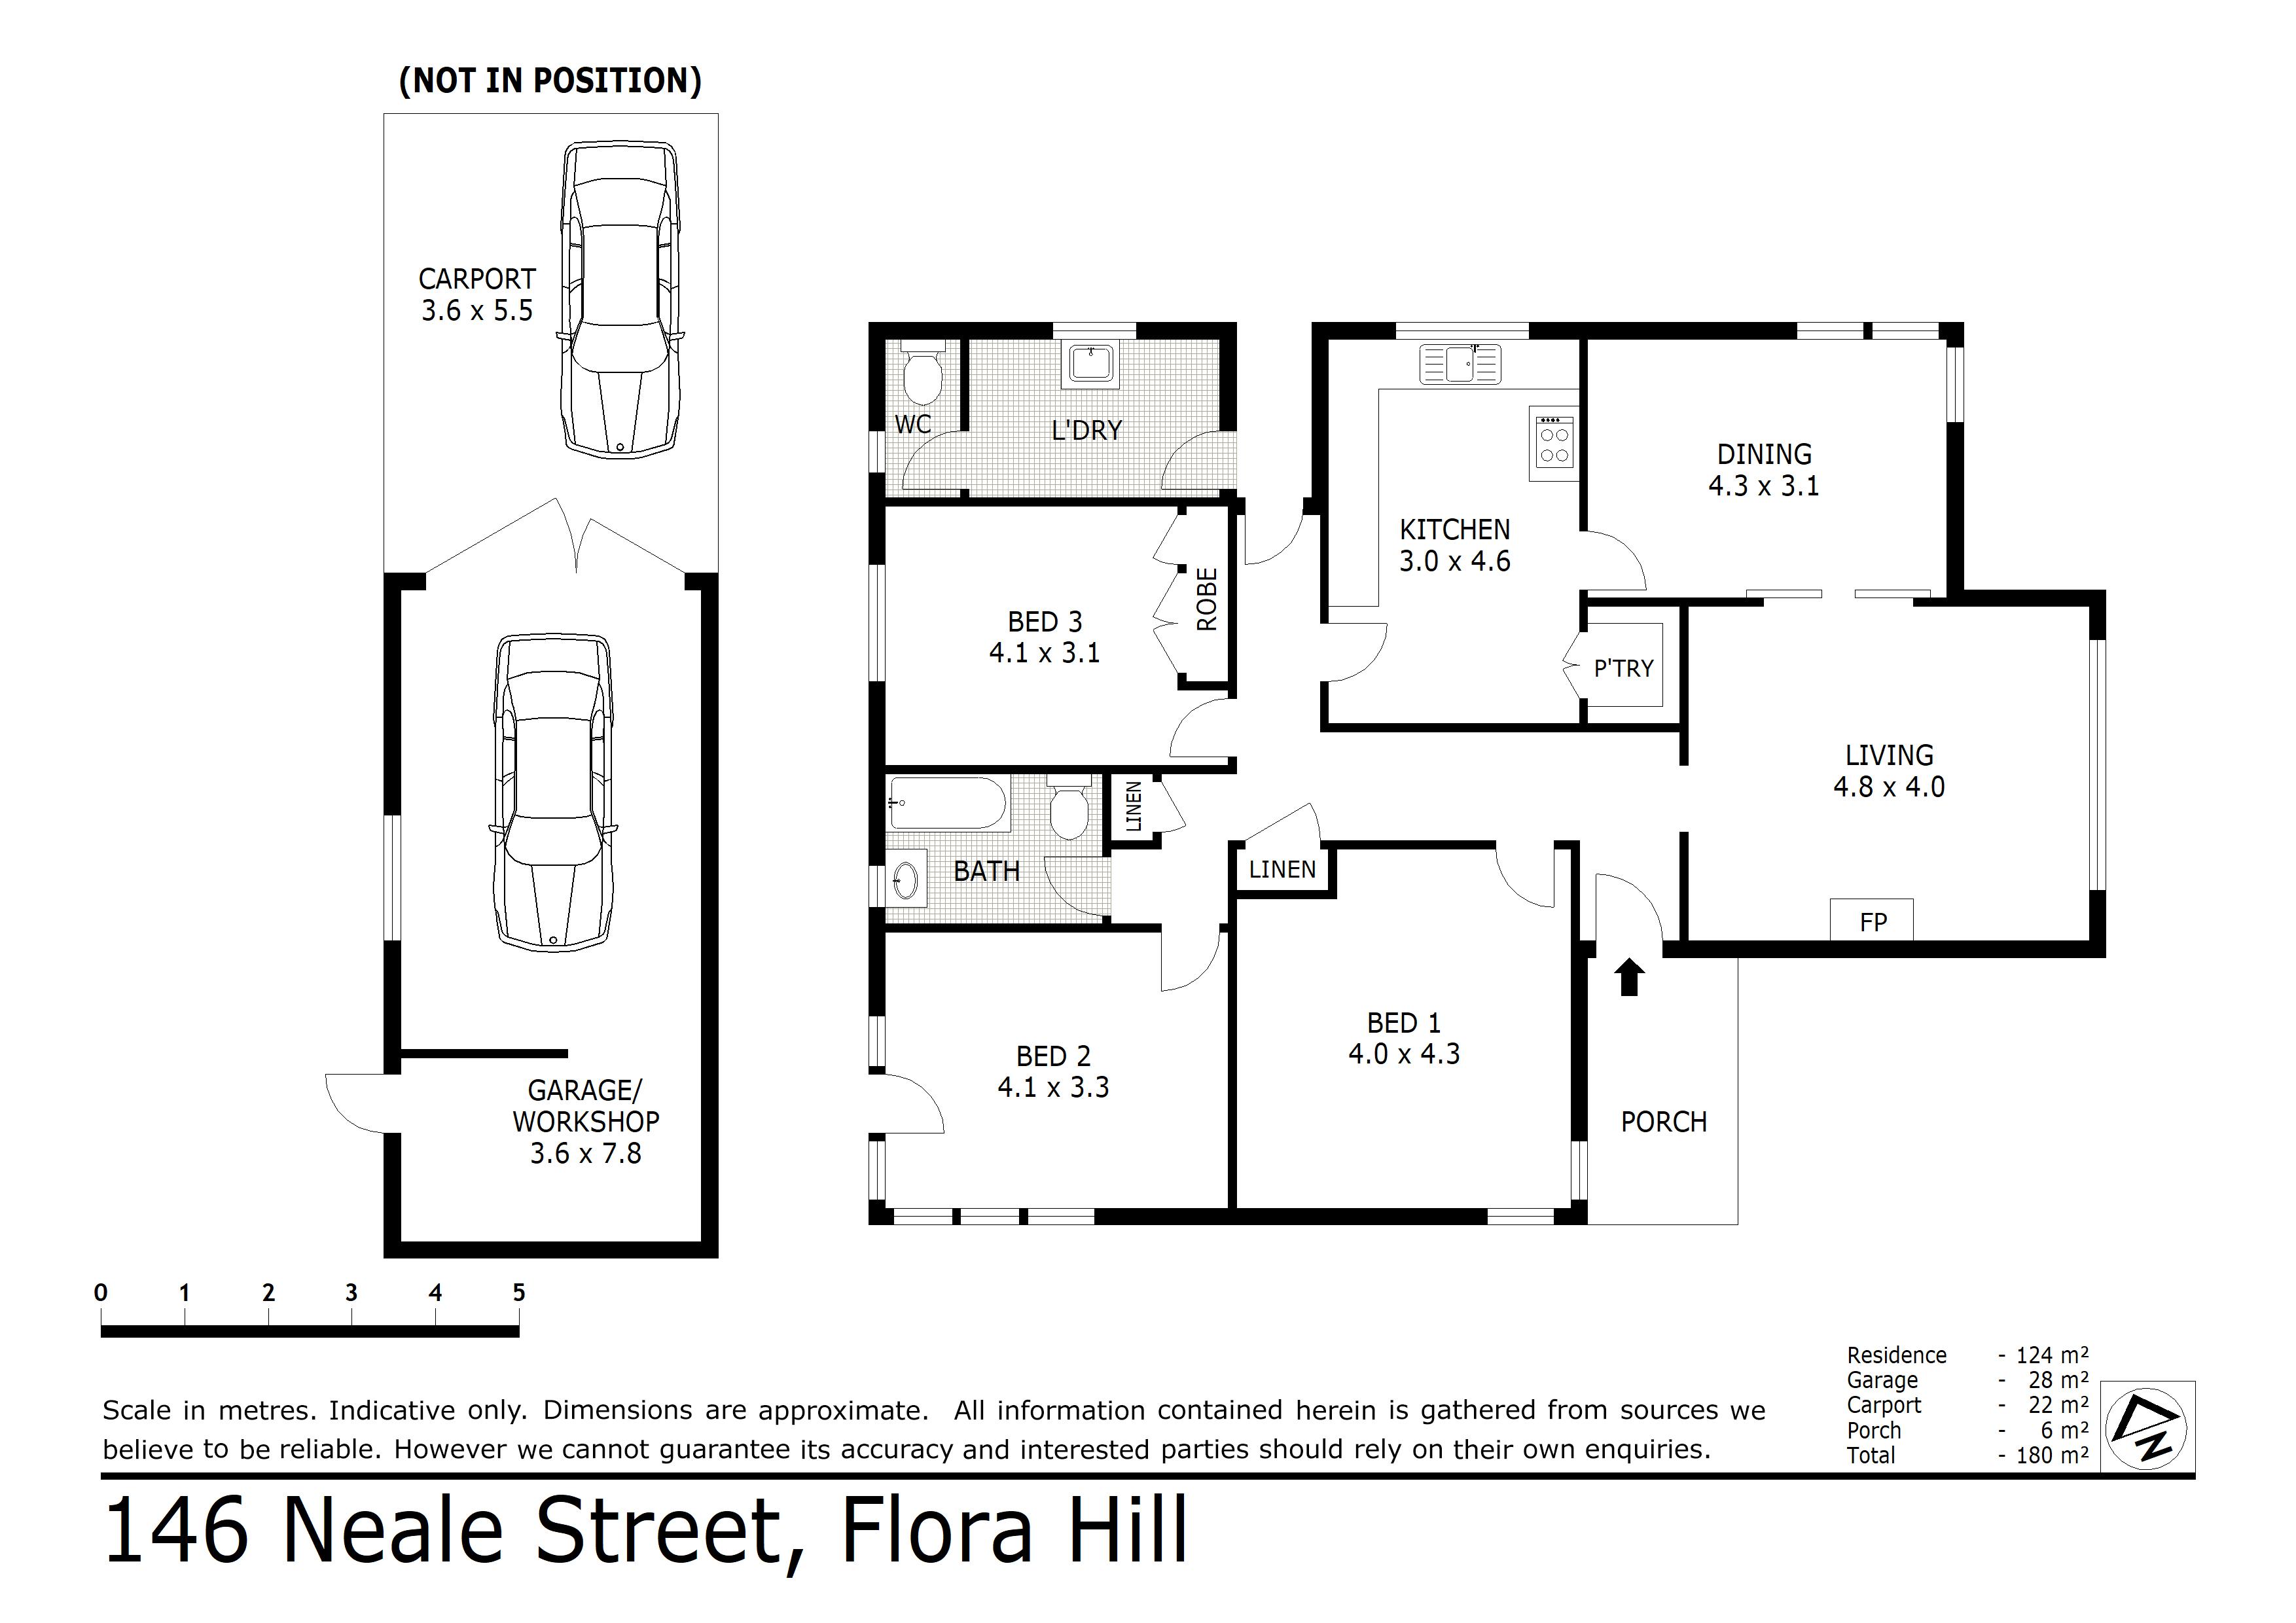 146 Neale Street, Flora Hill, VIC 3550